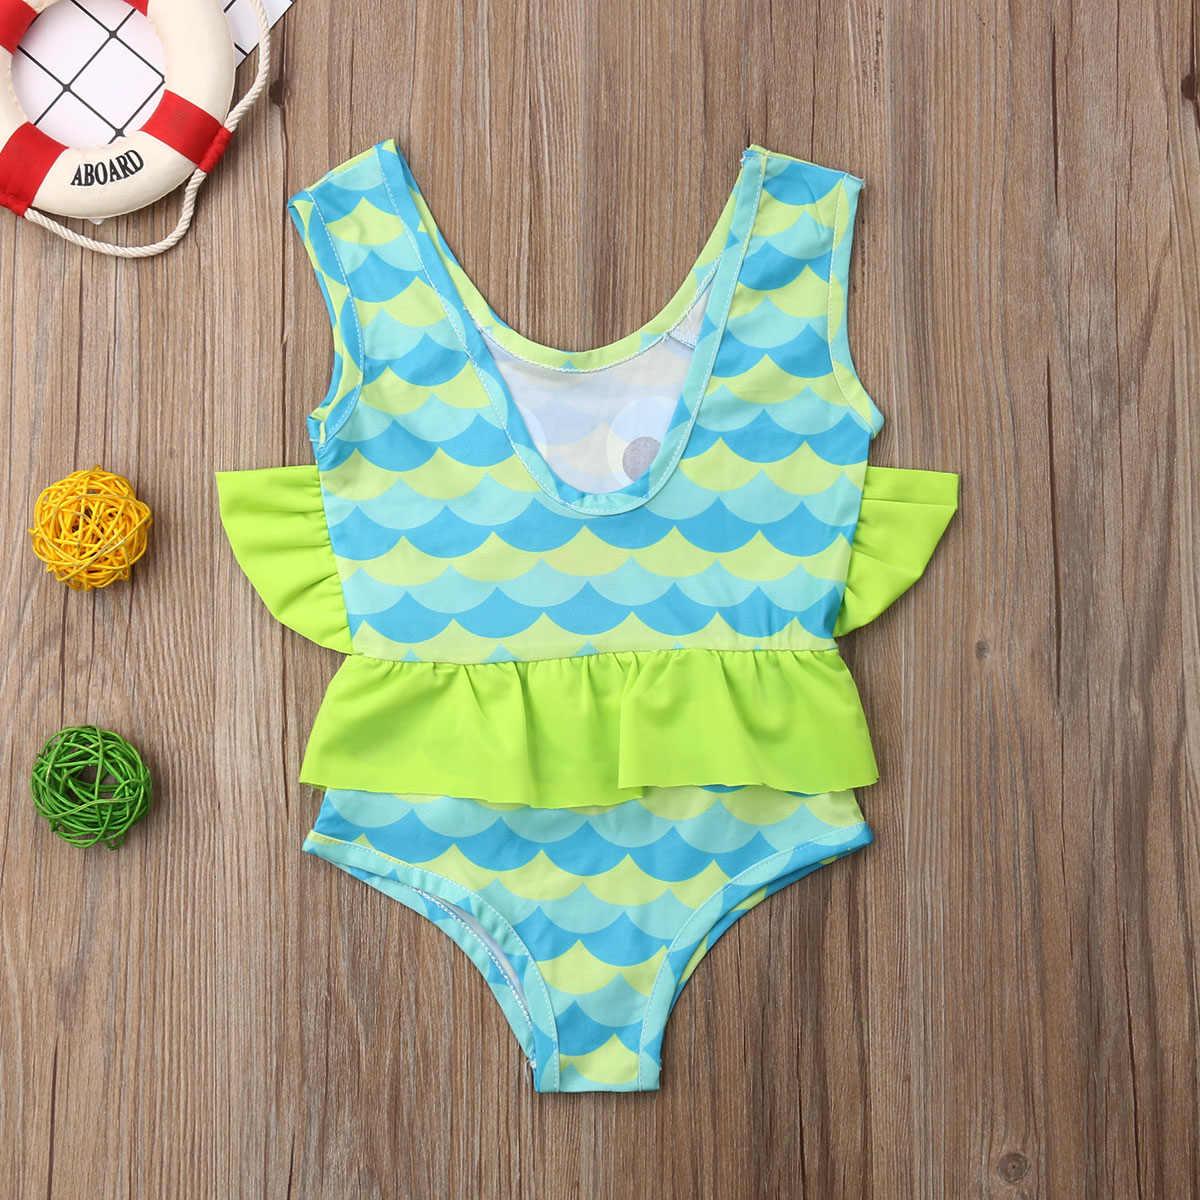 d37cef083f4a0 ... 2019 Brand New Toddler Kid Baby Girl Fish Tankini One Piece Ruffled Cotton  Bikini Swimwear Swimsuit ...